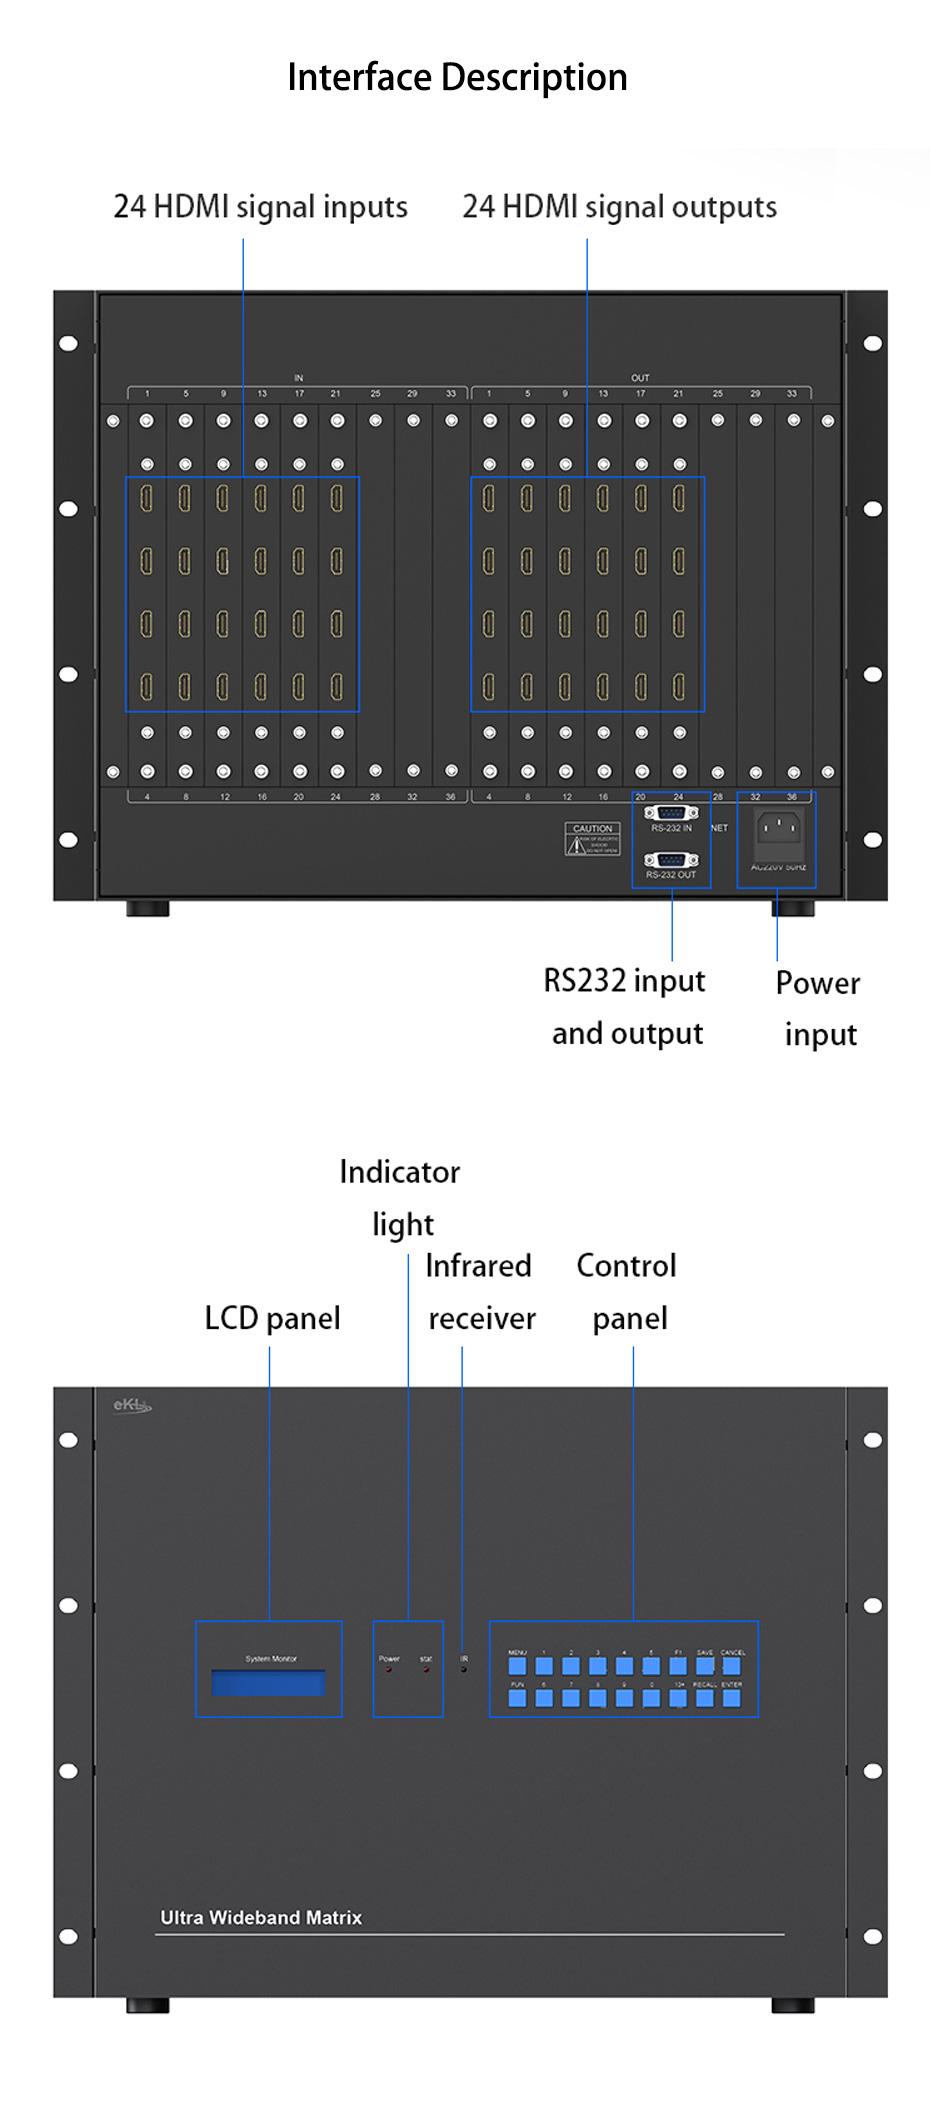 HDMI matrix 24 in 24 out 2424H interface description